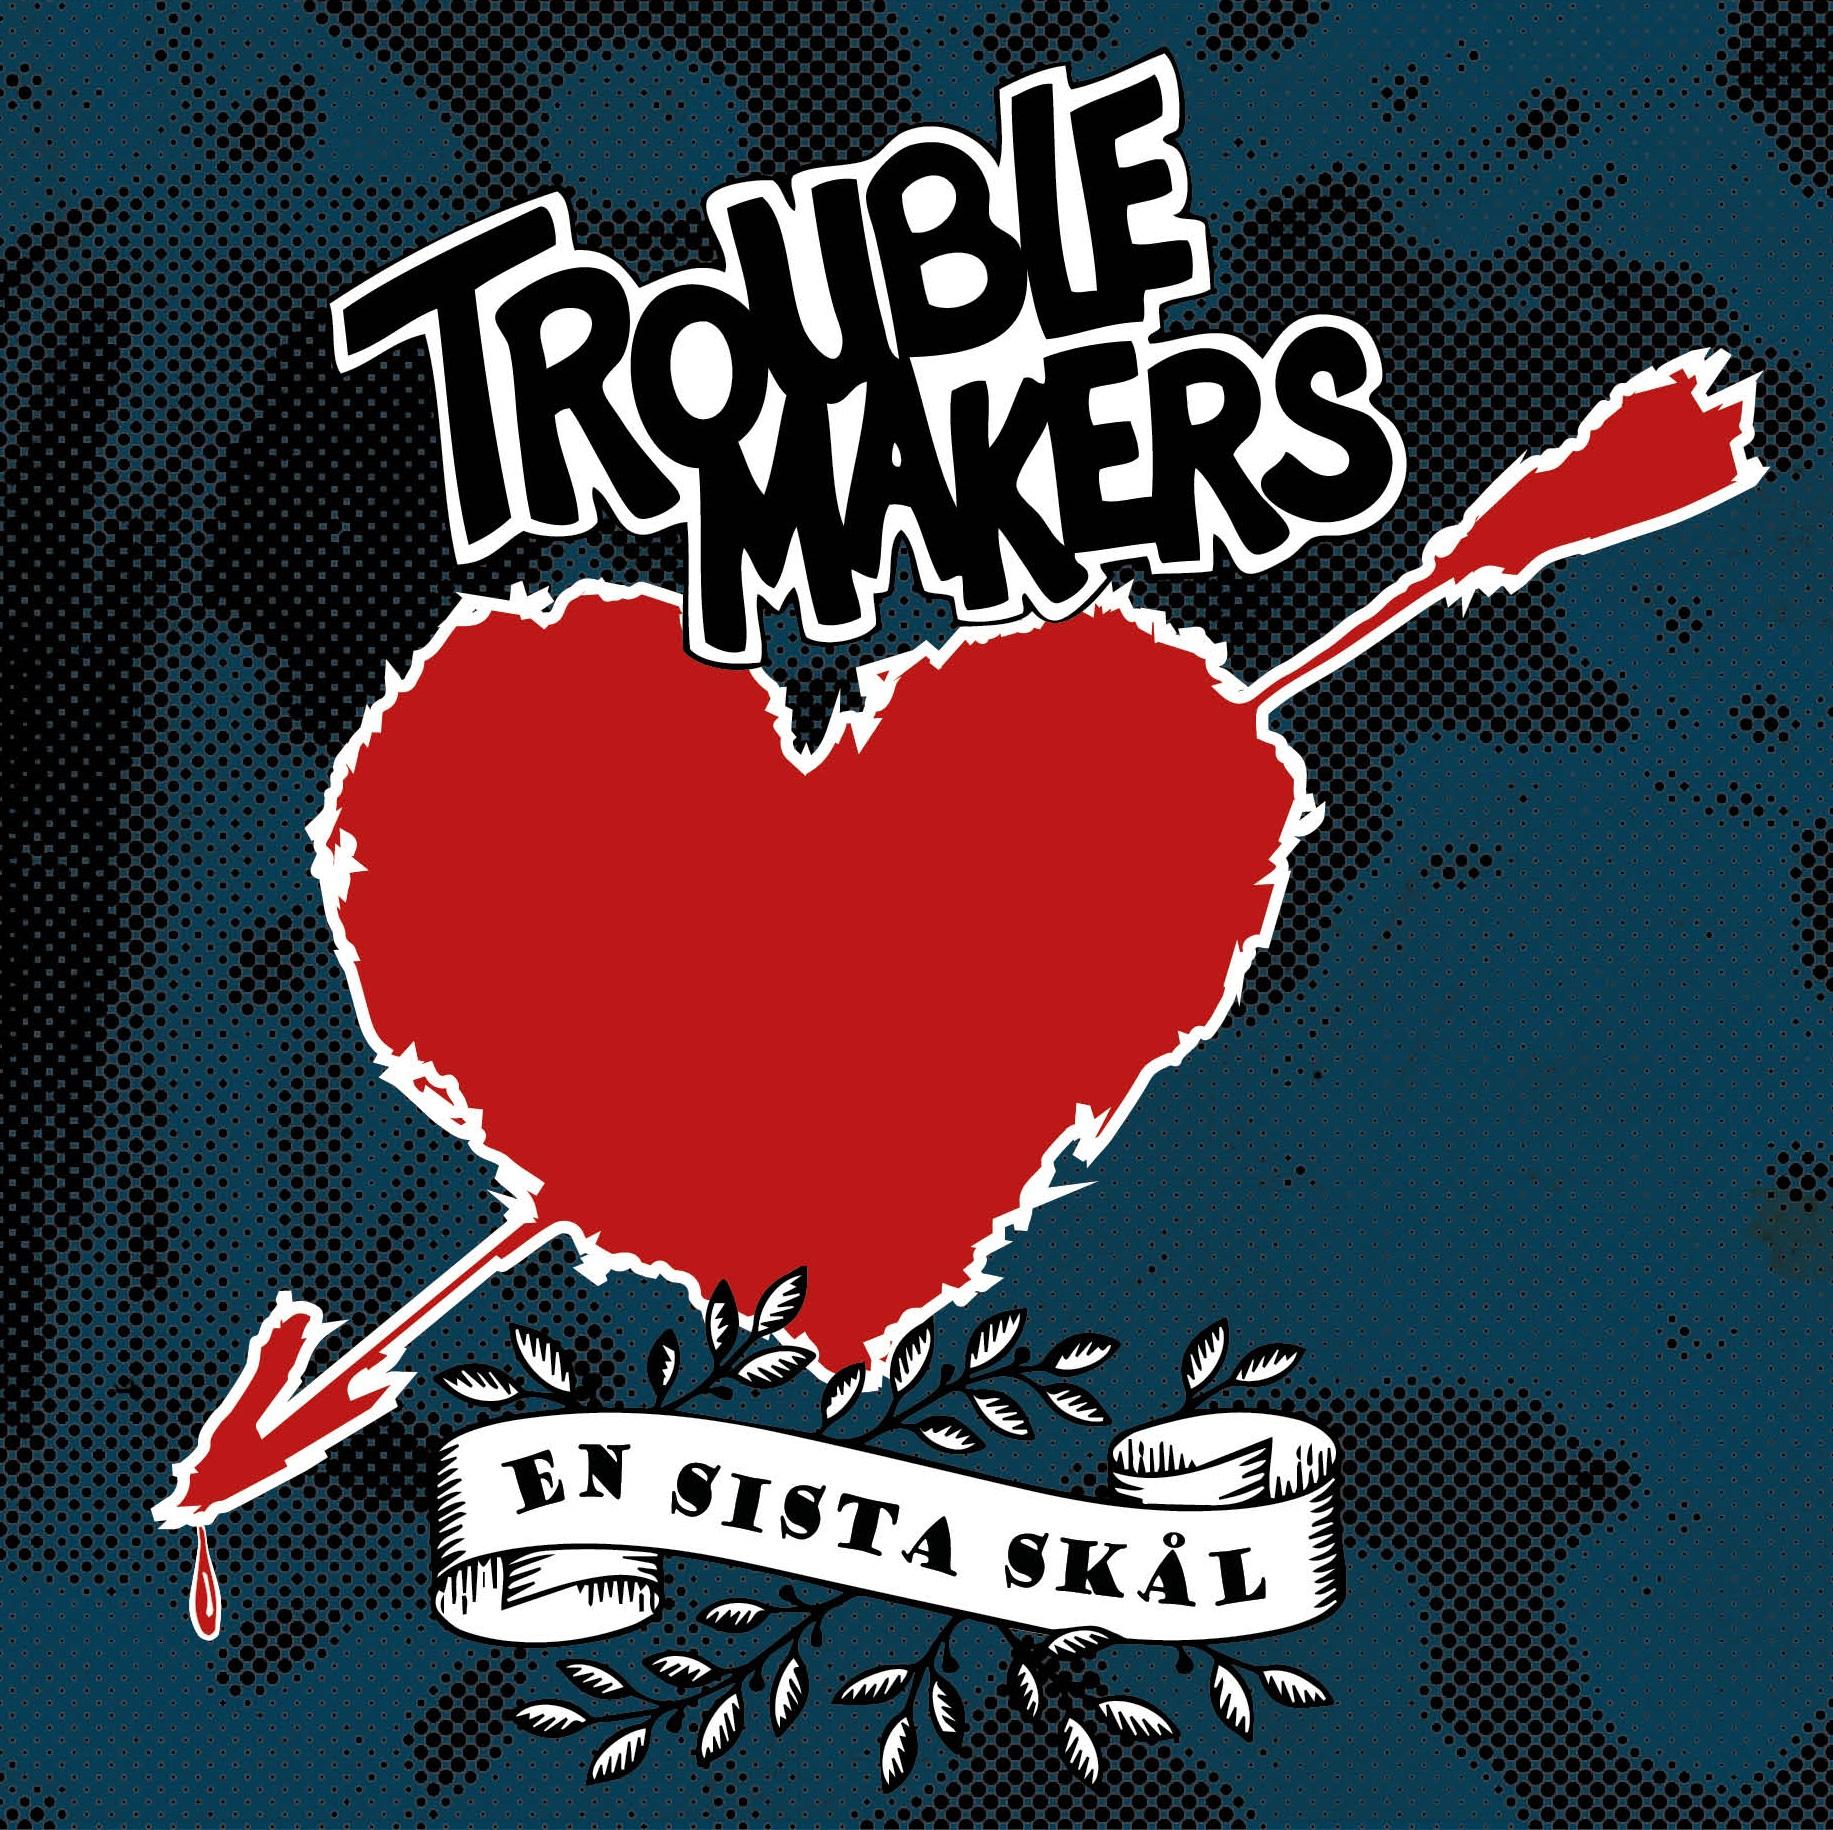 Troublemakers – En Sista Skål